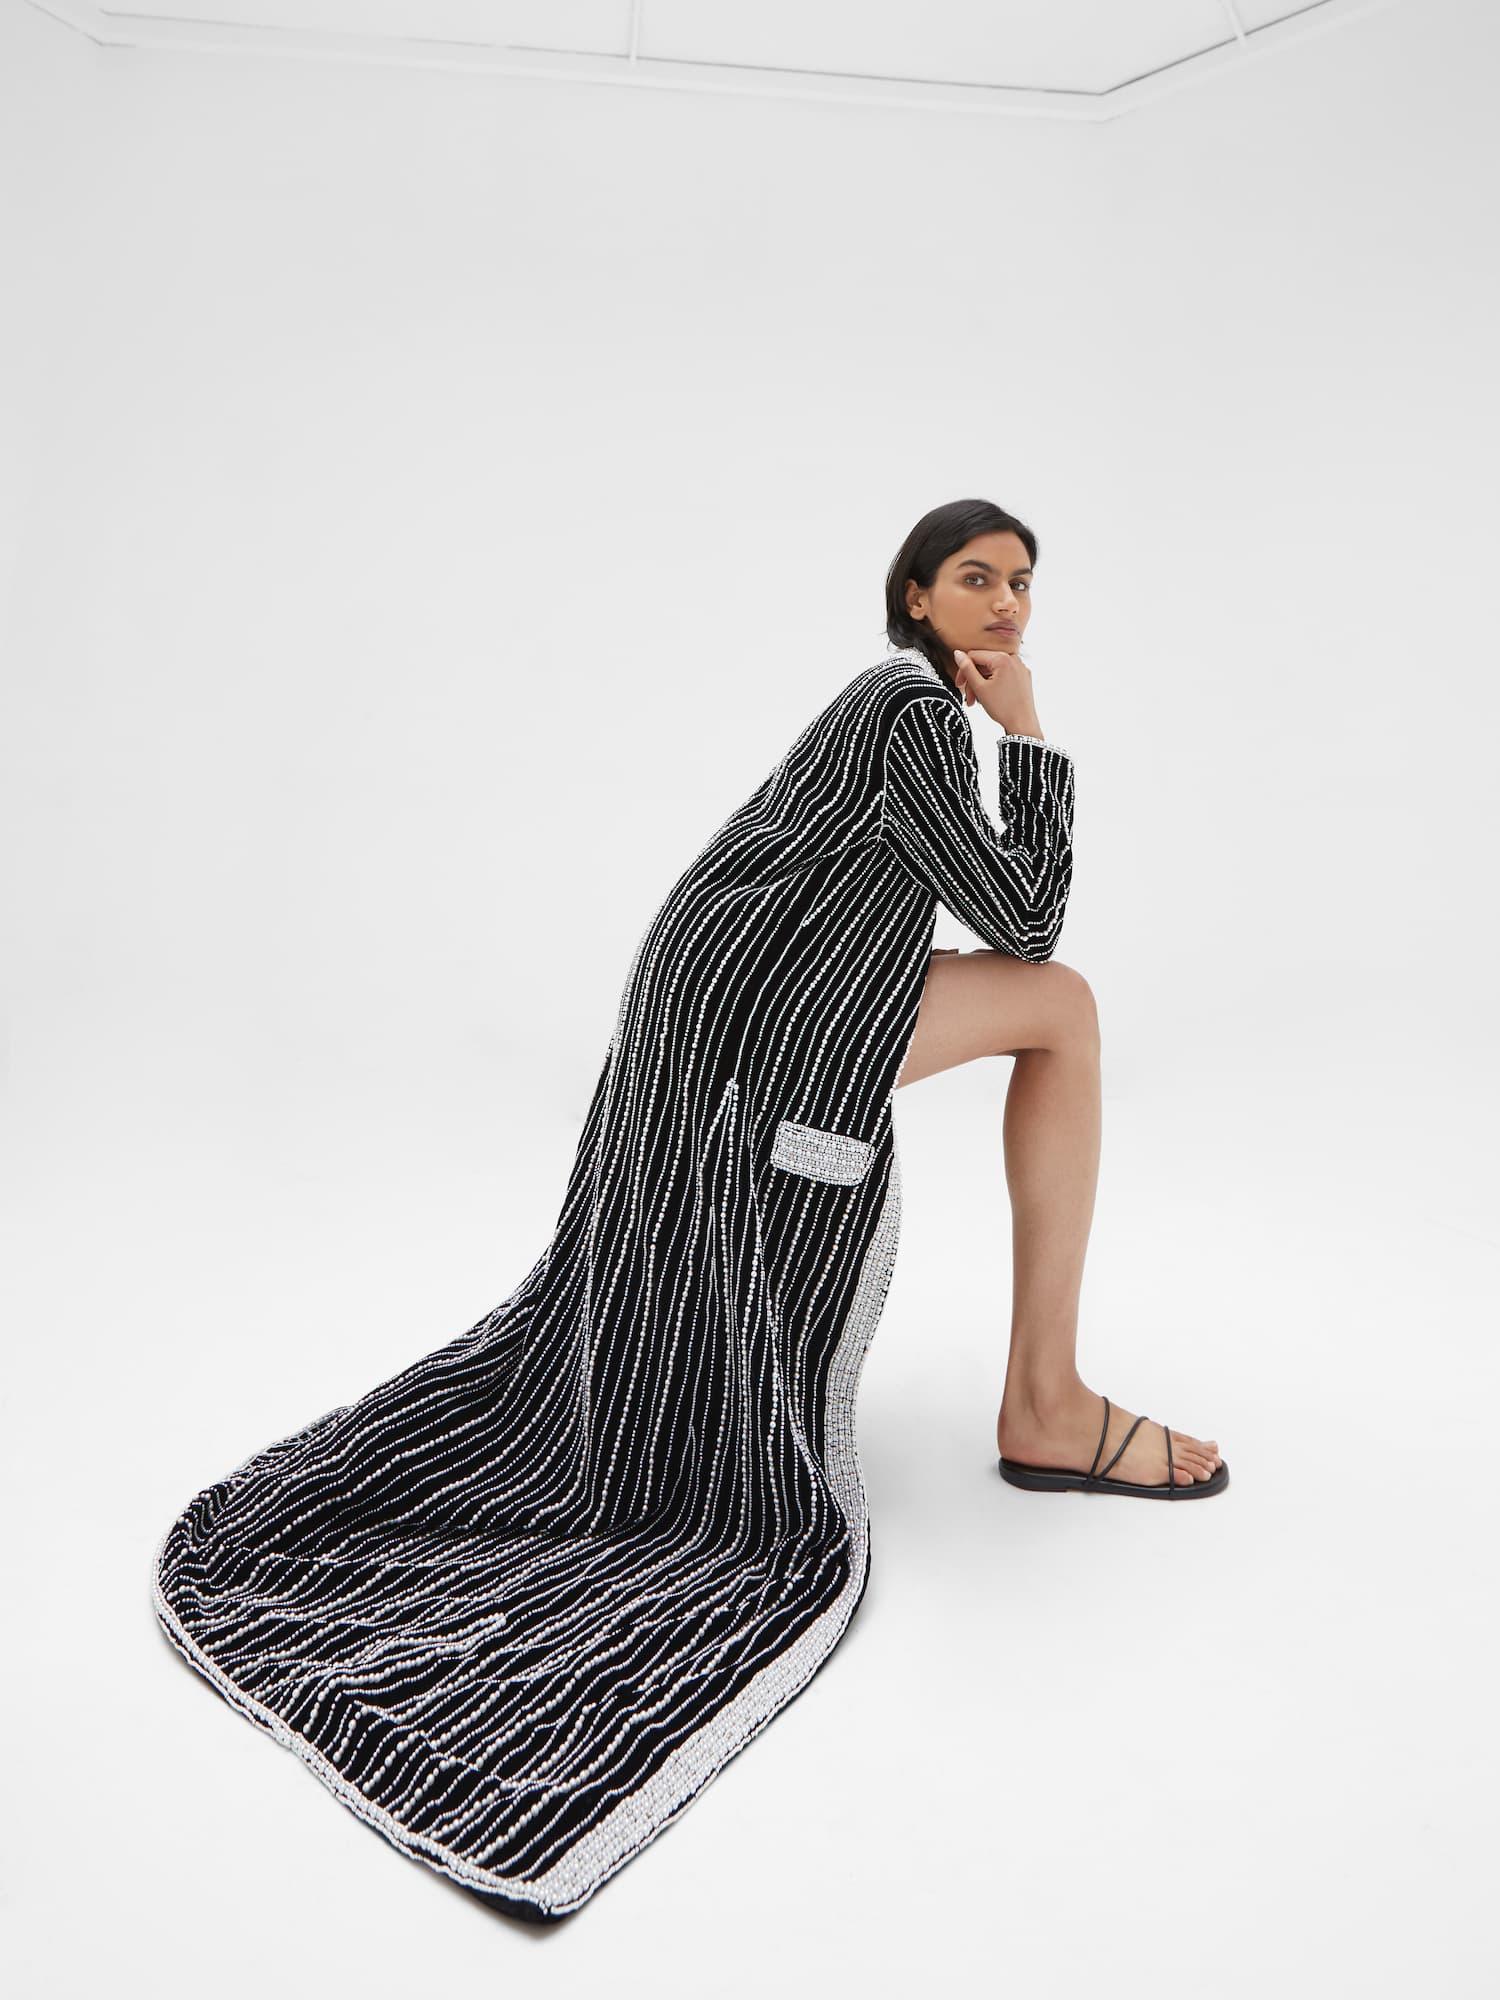 View 4 of model wearing Kasia Kimono in black.